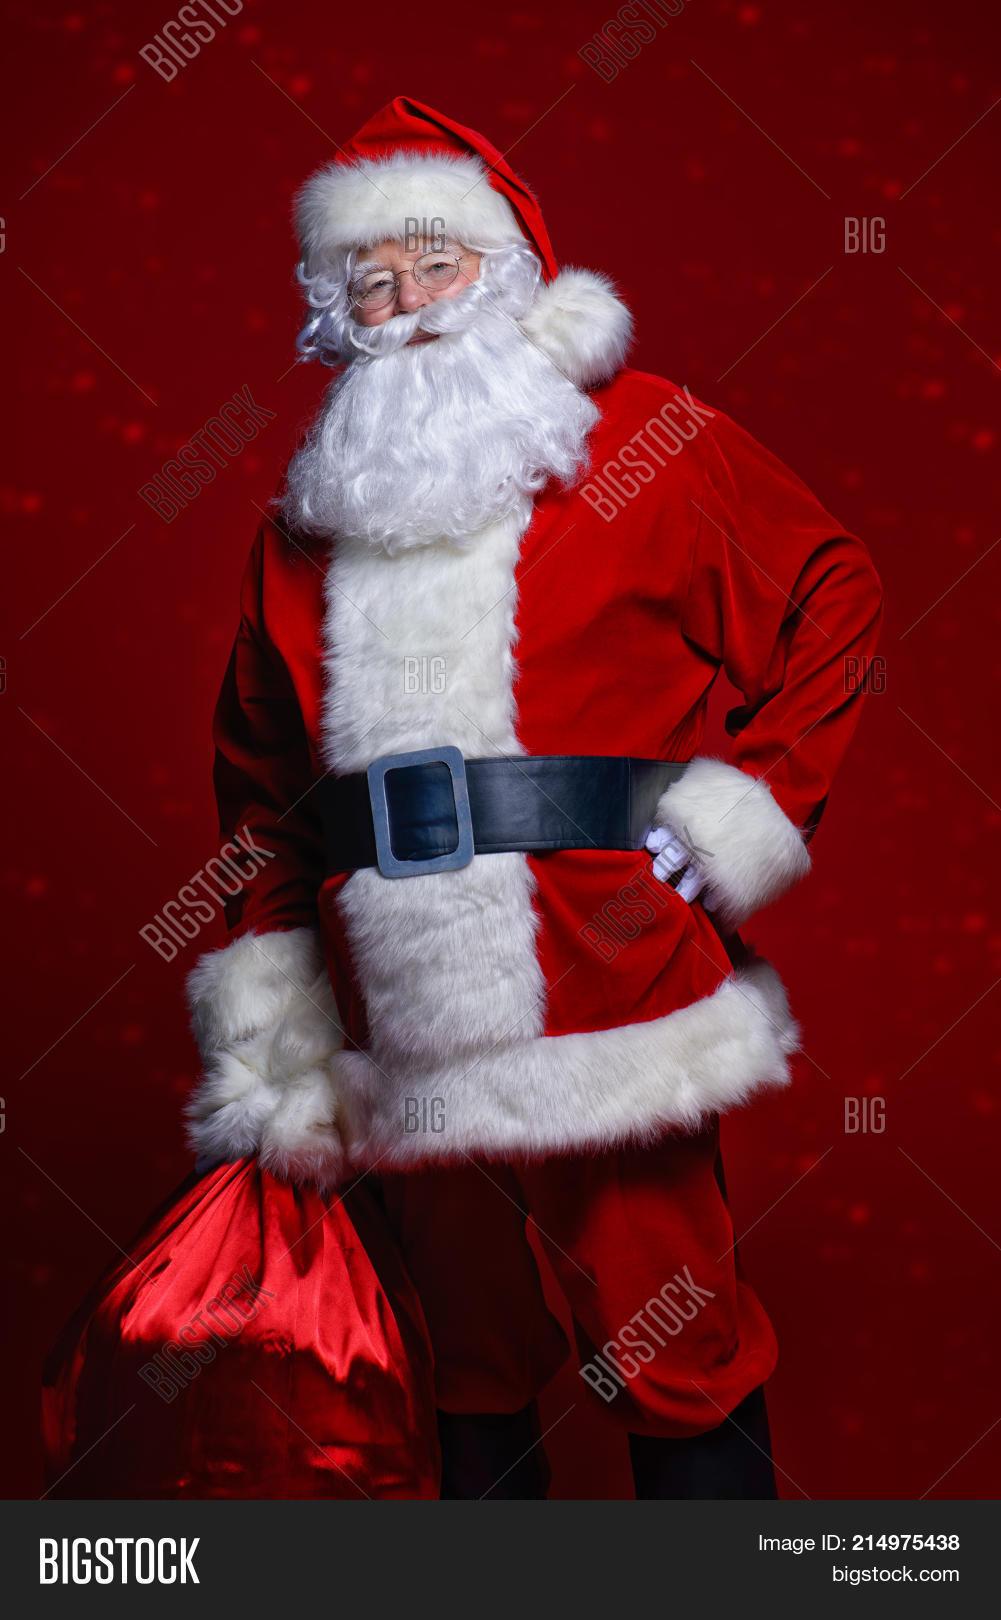 Christmas Concept. Image & Photo (Free Trial) | Bigstock